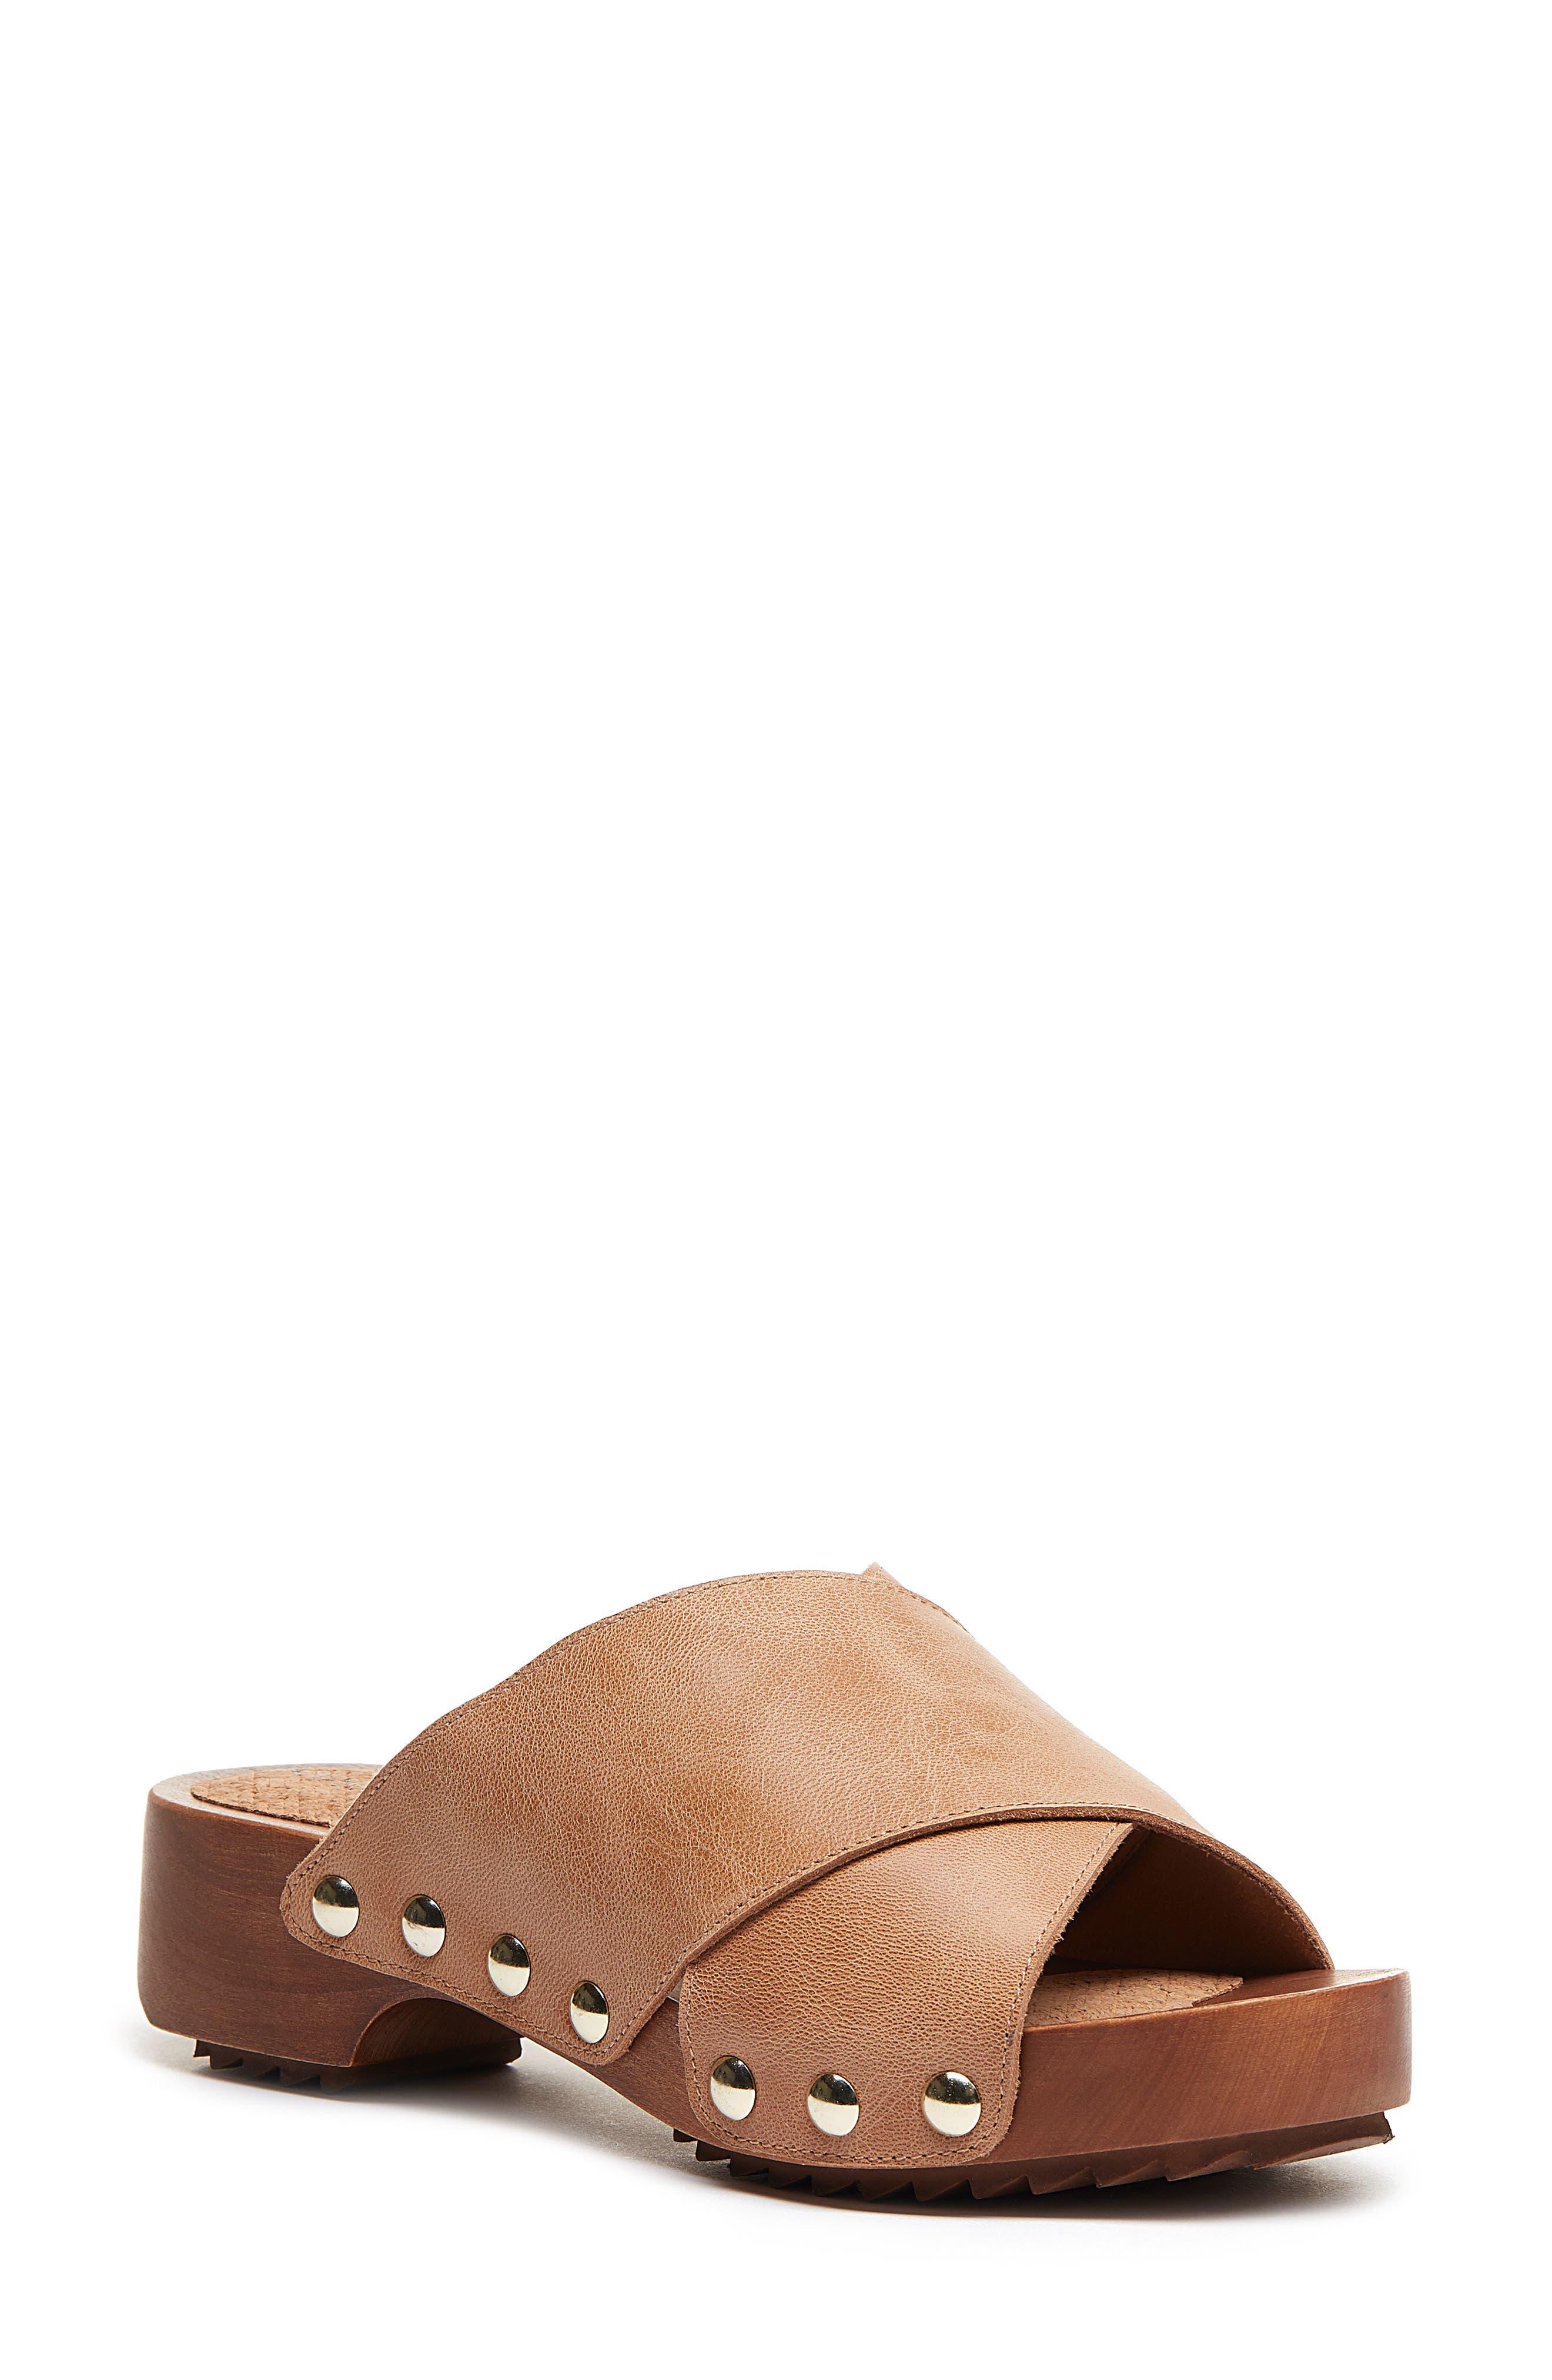 Gear Clog Slide Sandal